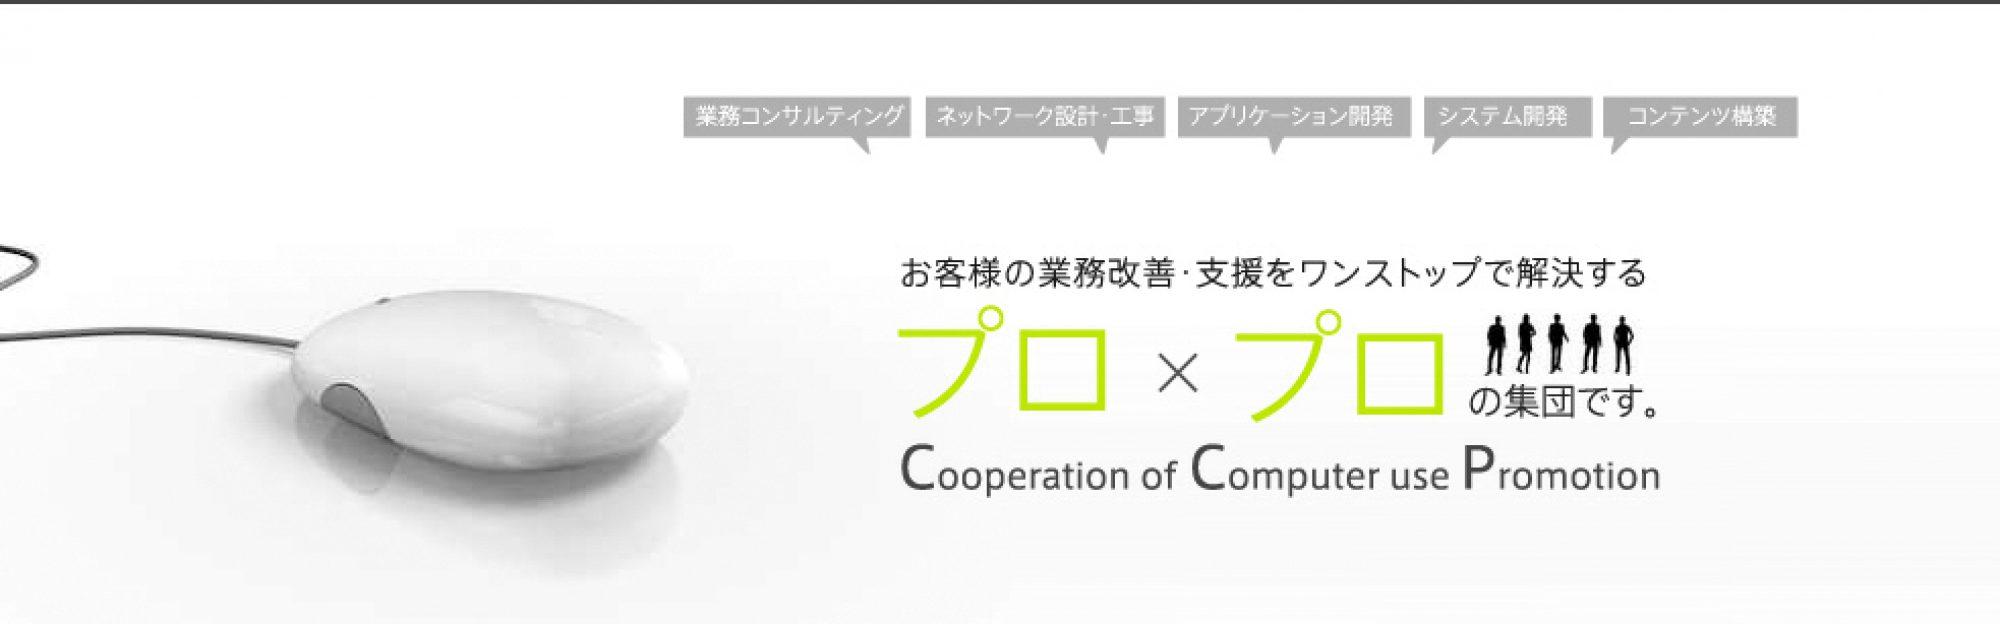 CCP コンピュータ利用促進協同組合